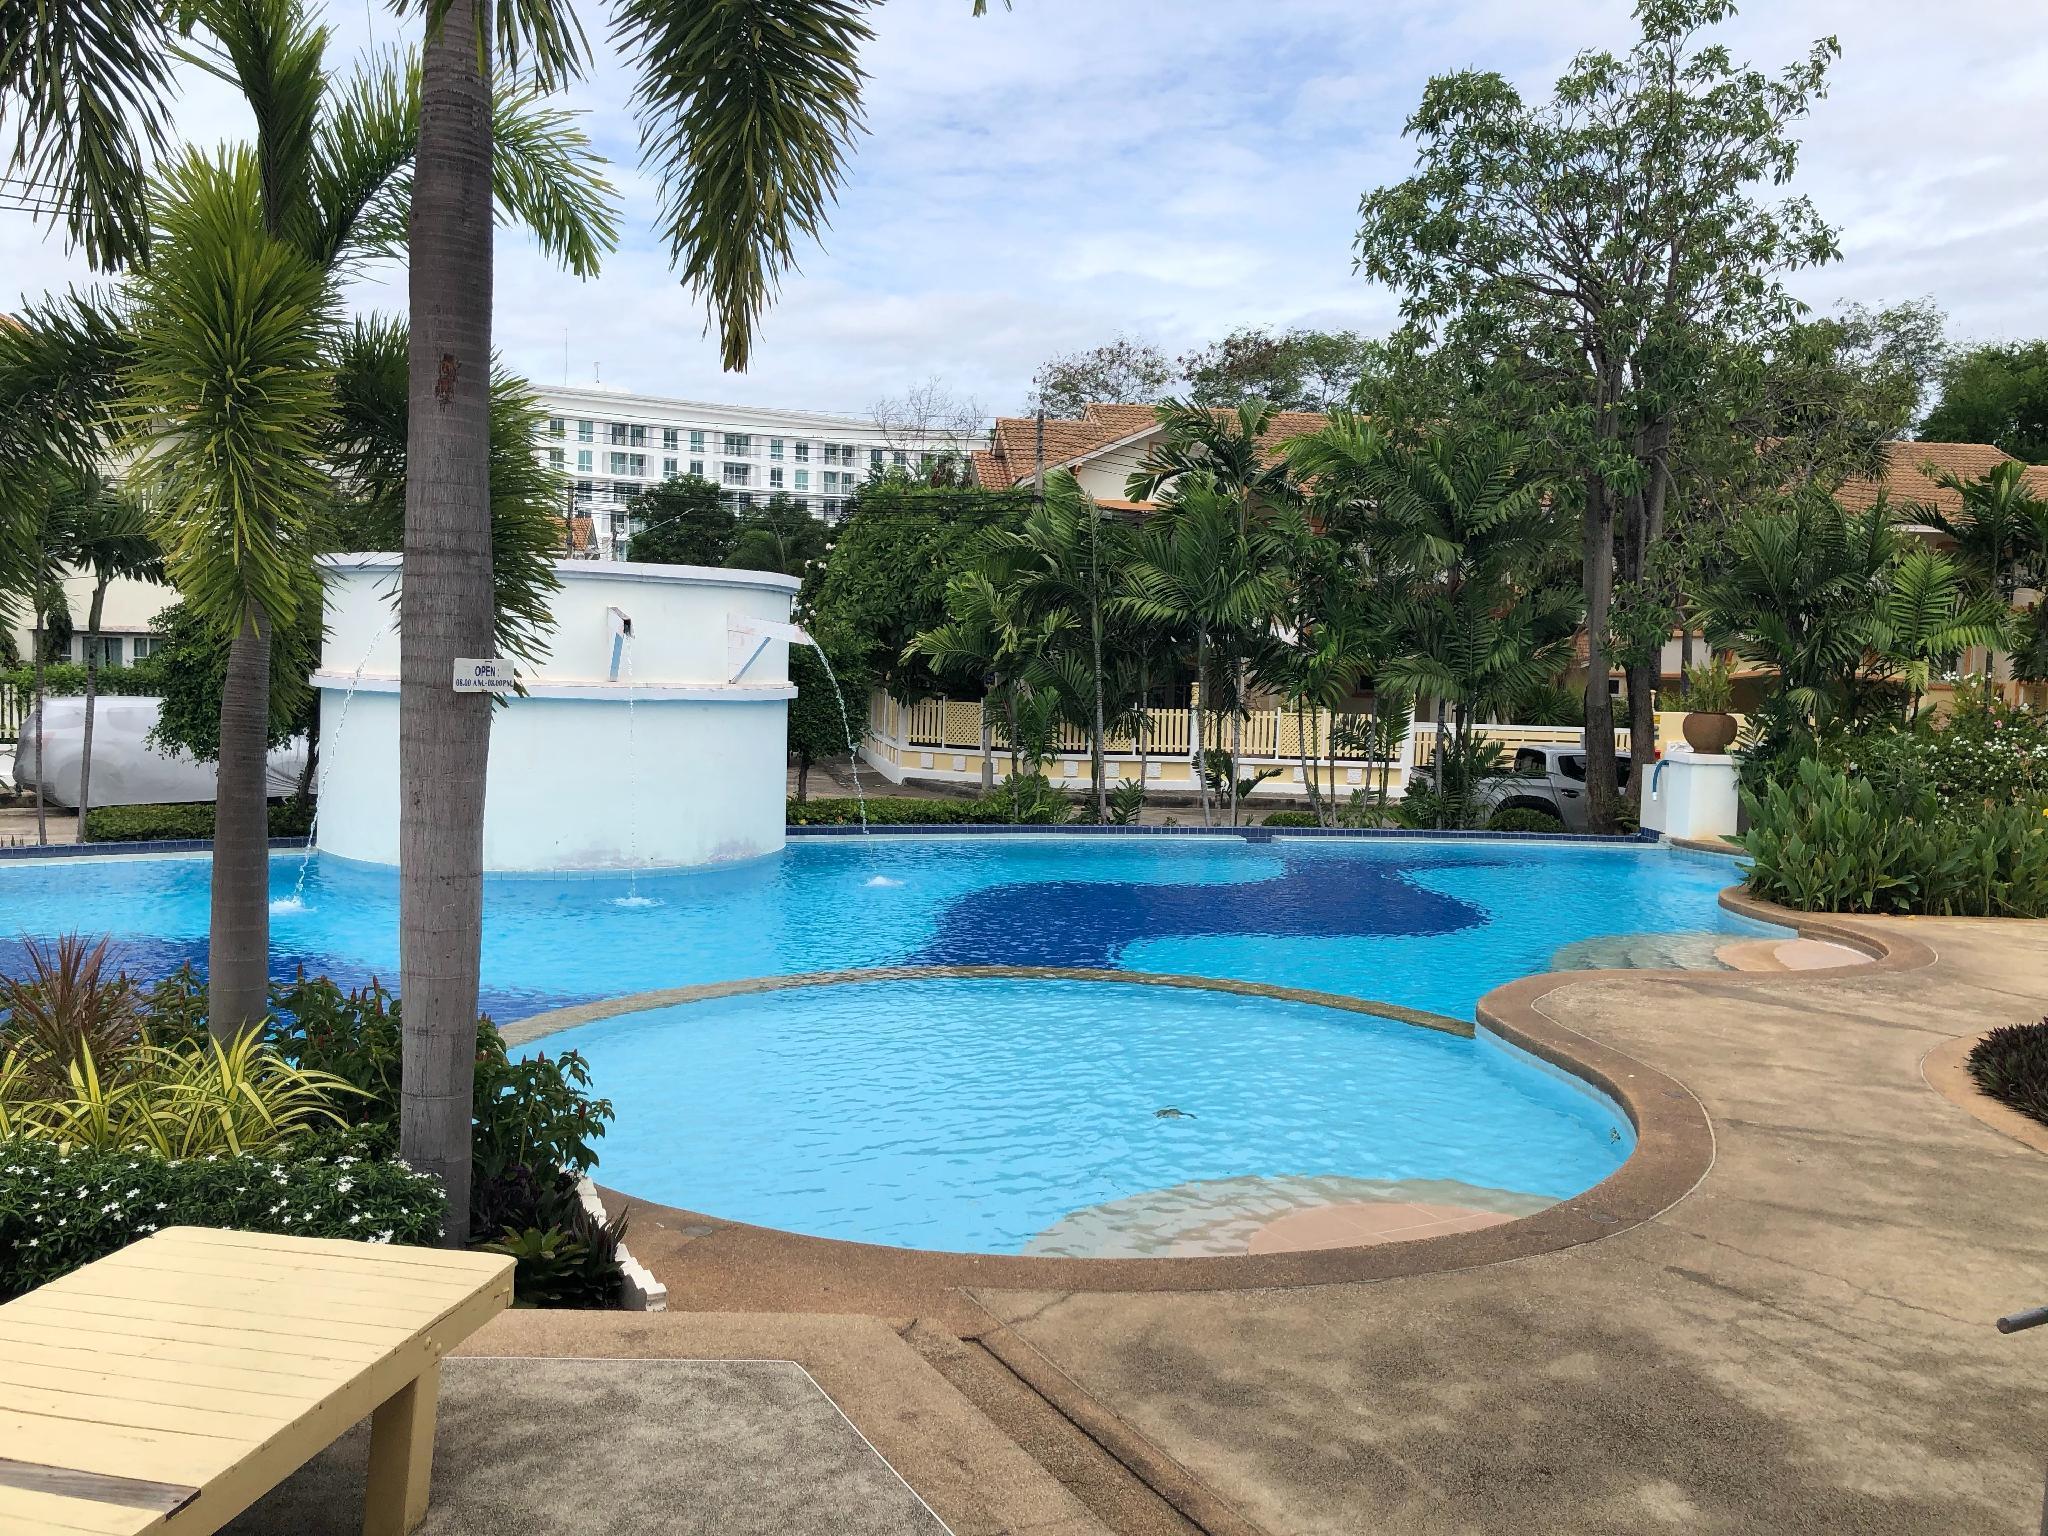 Pattaya Pool Villa TLH พัทยา พูลวิลลา ประเทศไทย